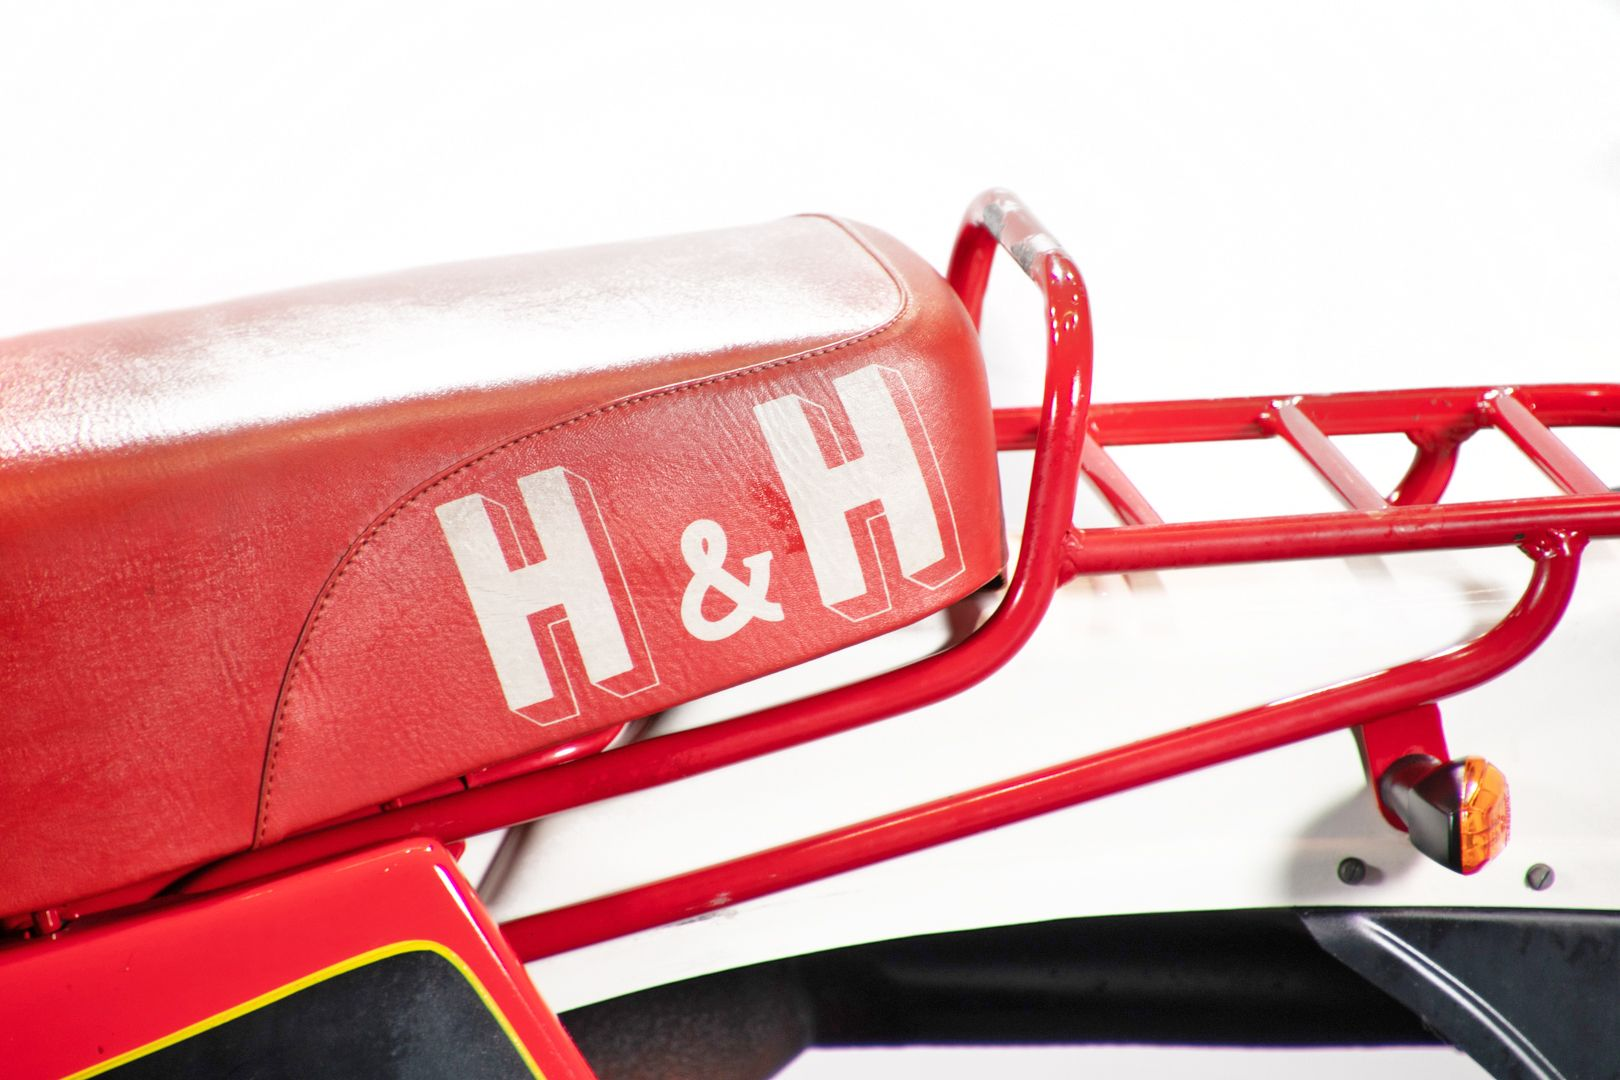 1984 Italjet HH 39425